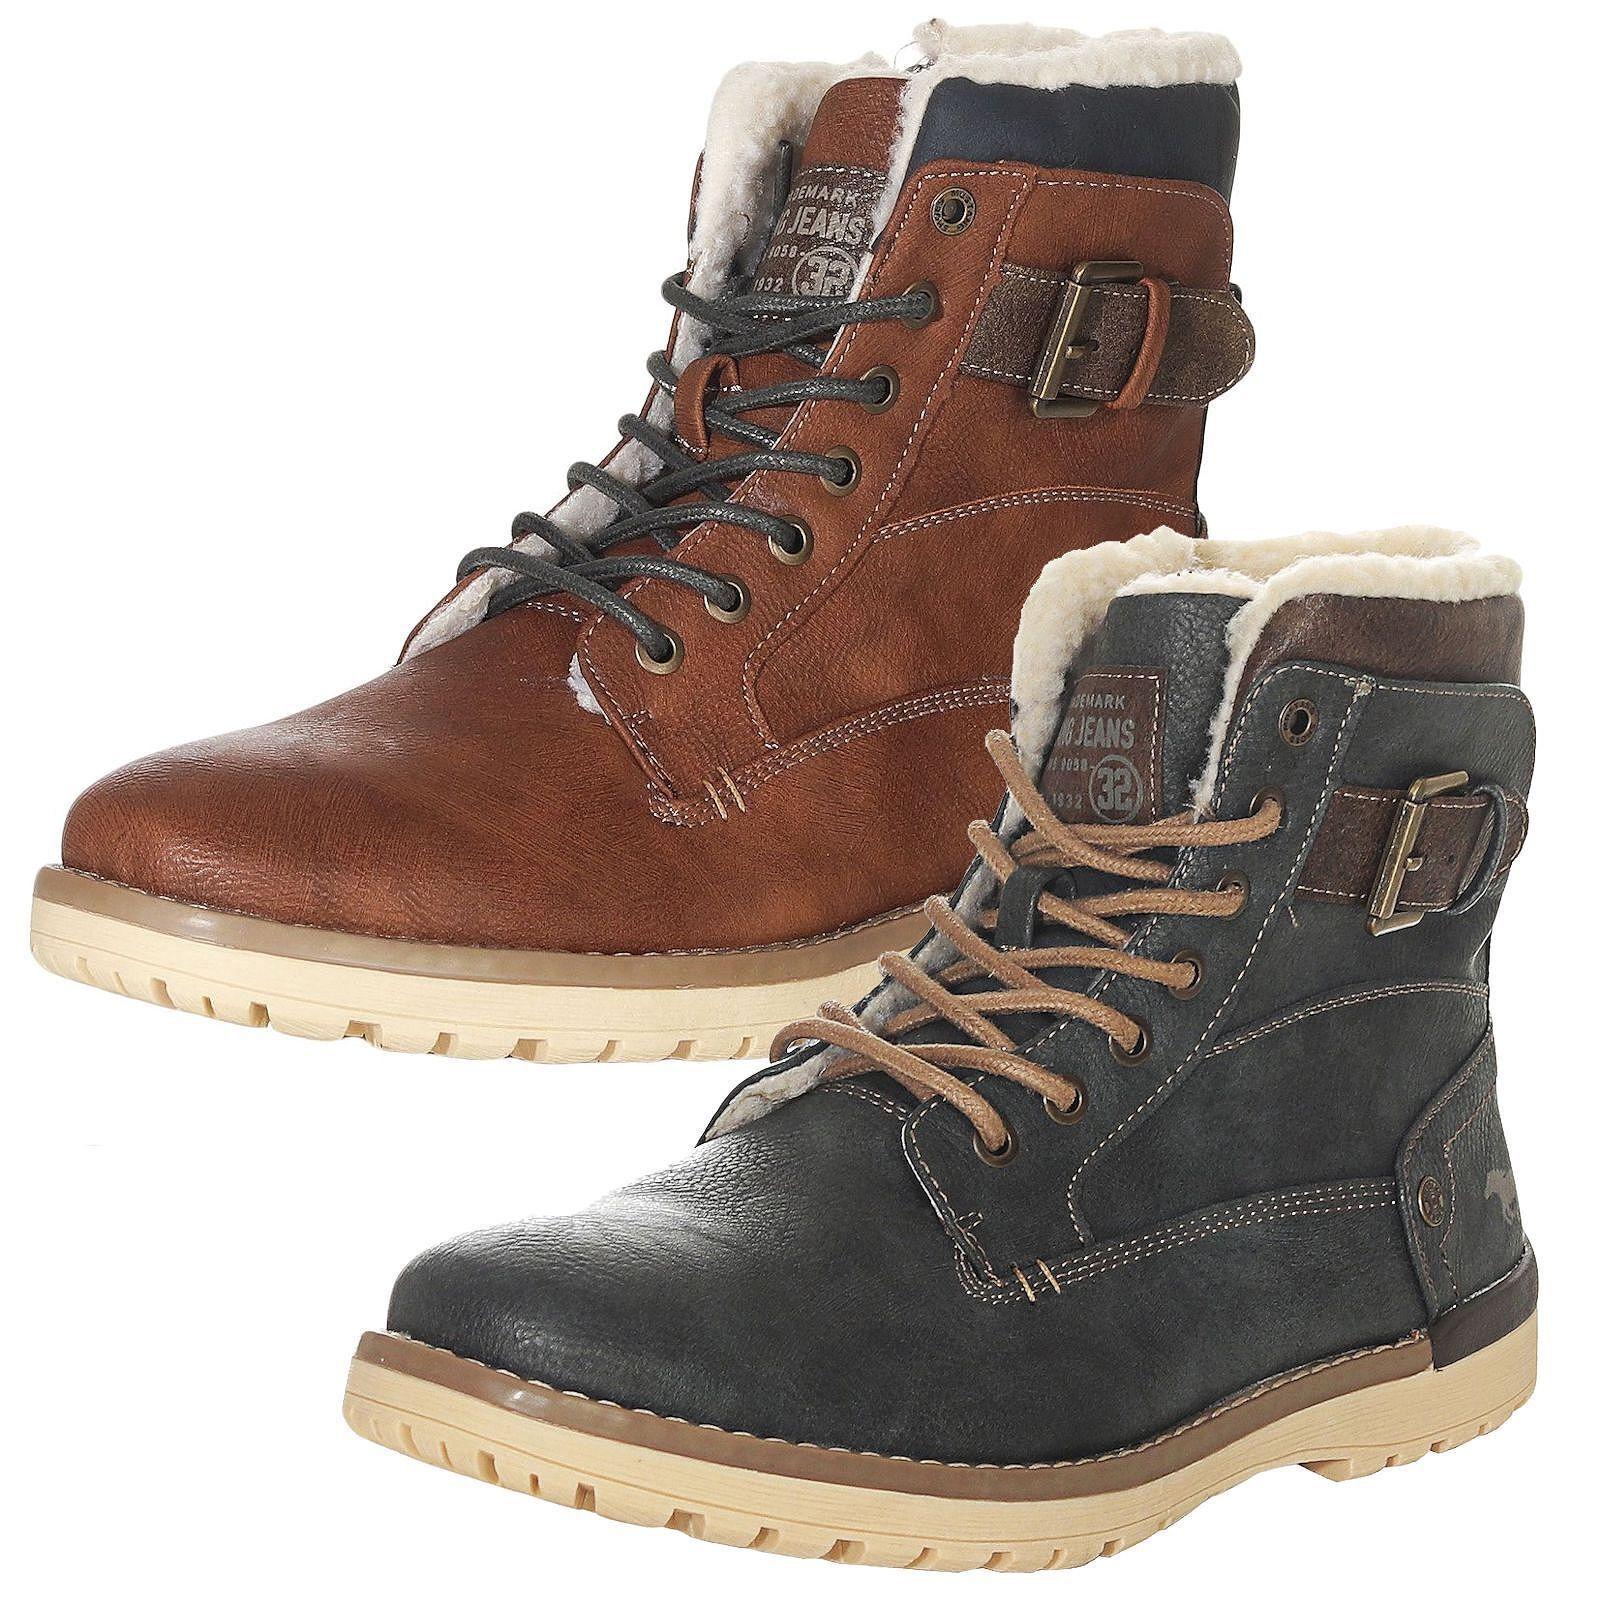 beste Qualität Mustang Herren Schuhe Winterschuhe Stiefel